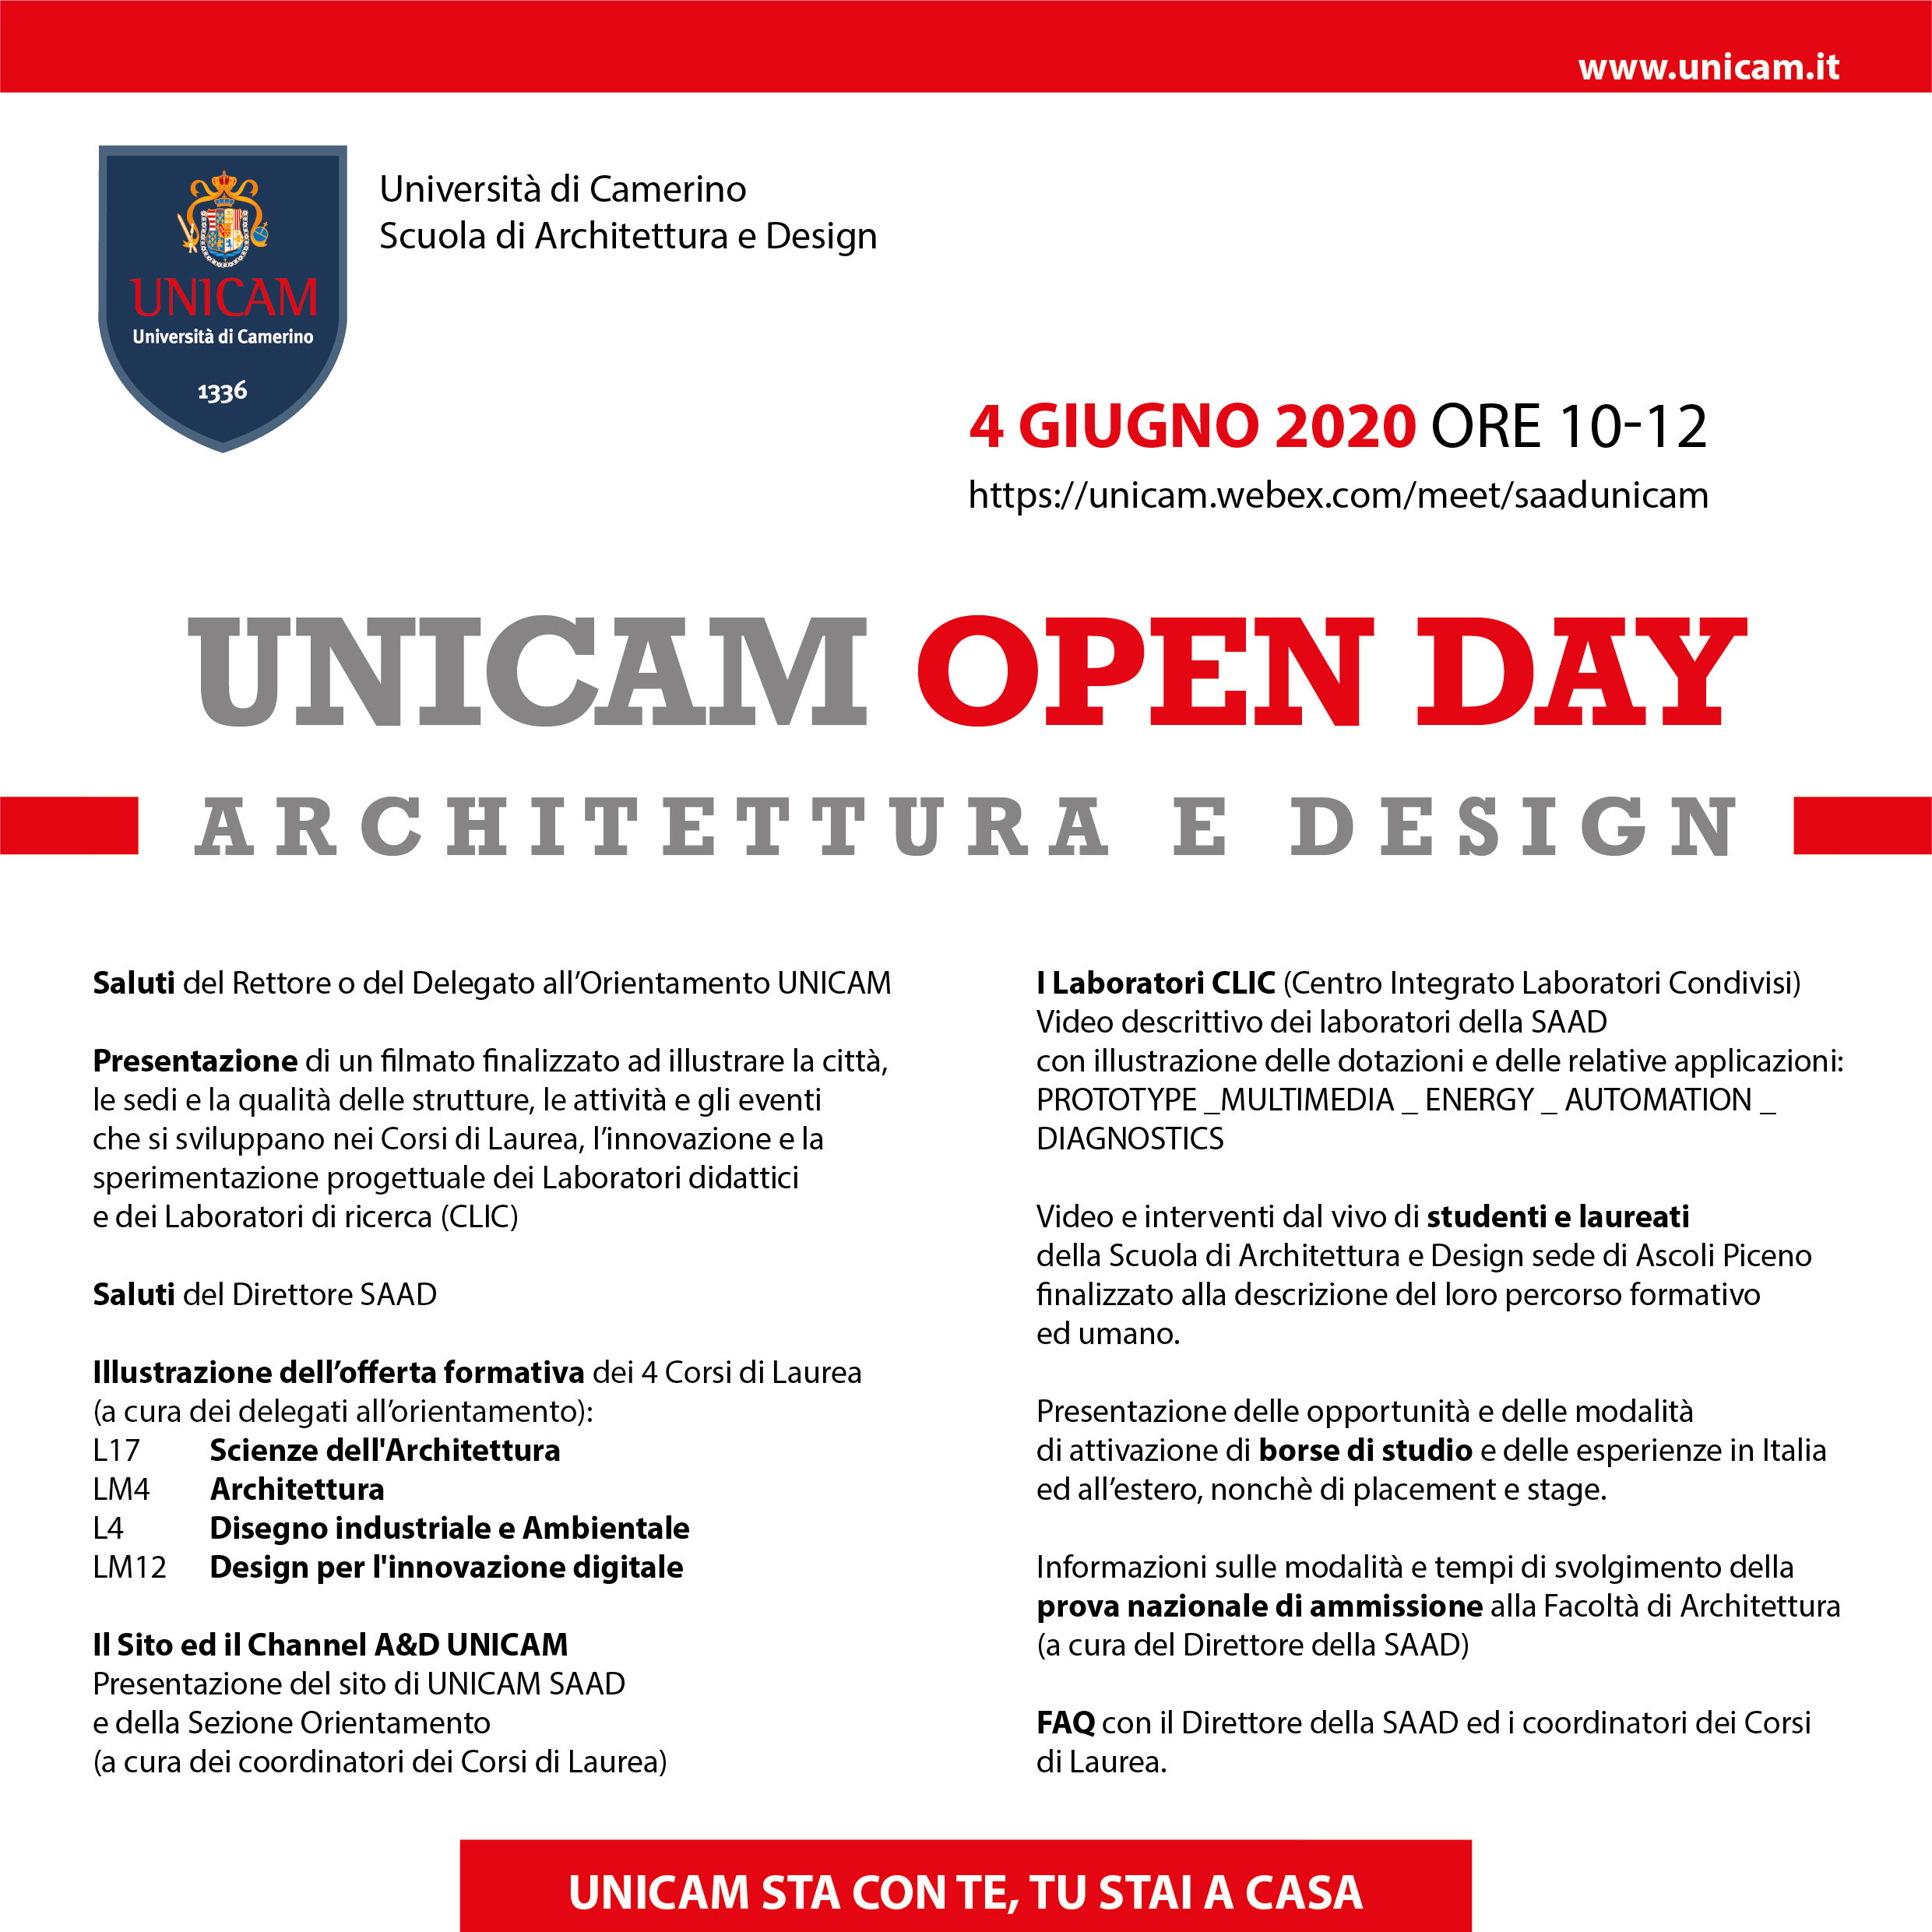 open day design architettura